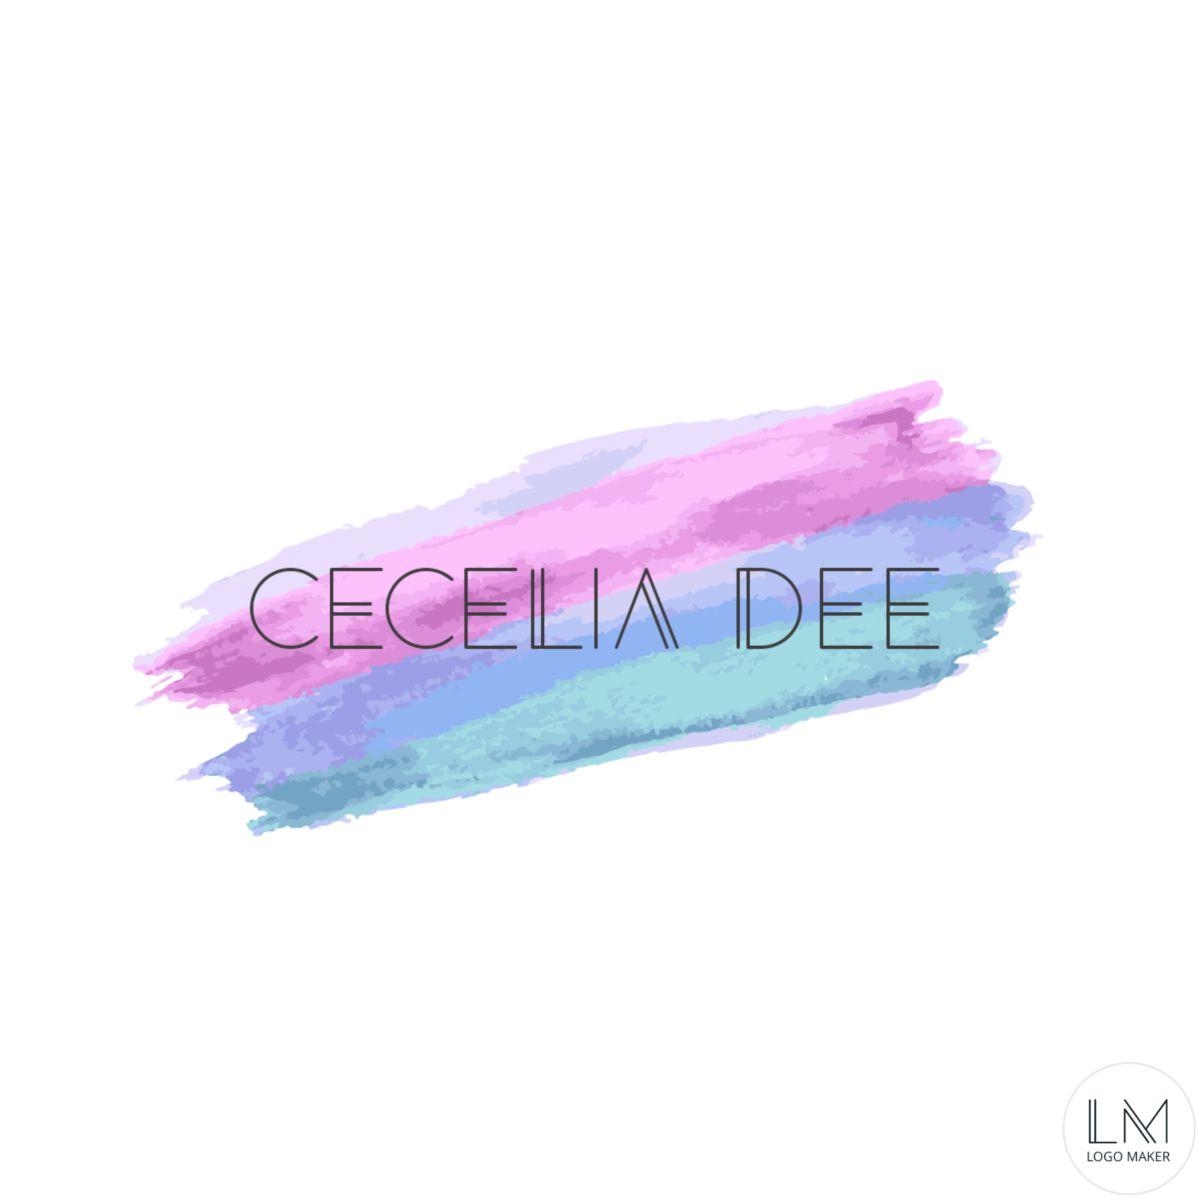 @ceceliadee90